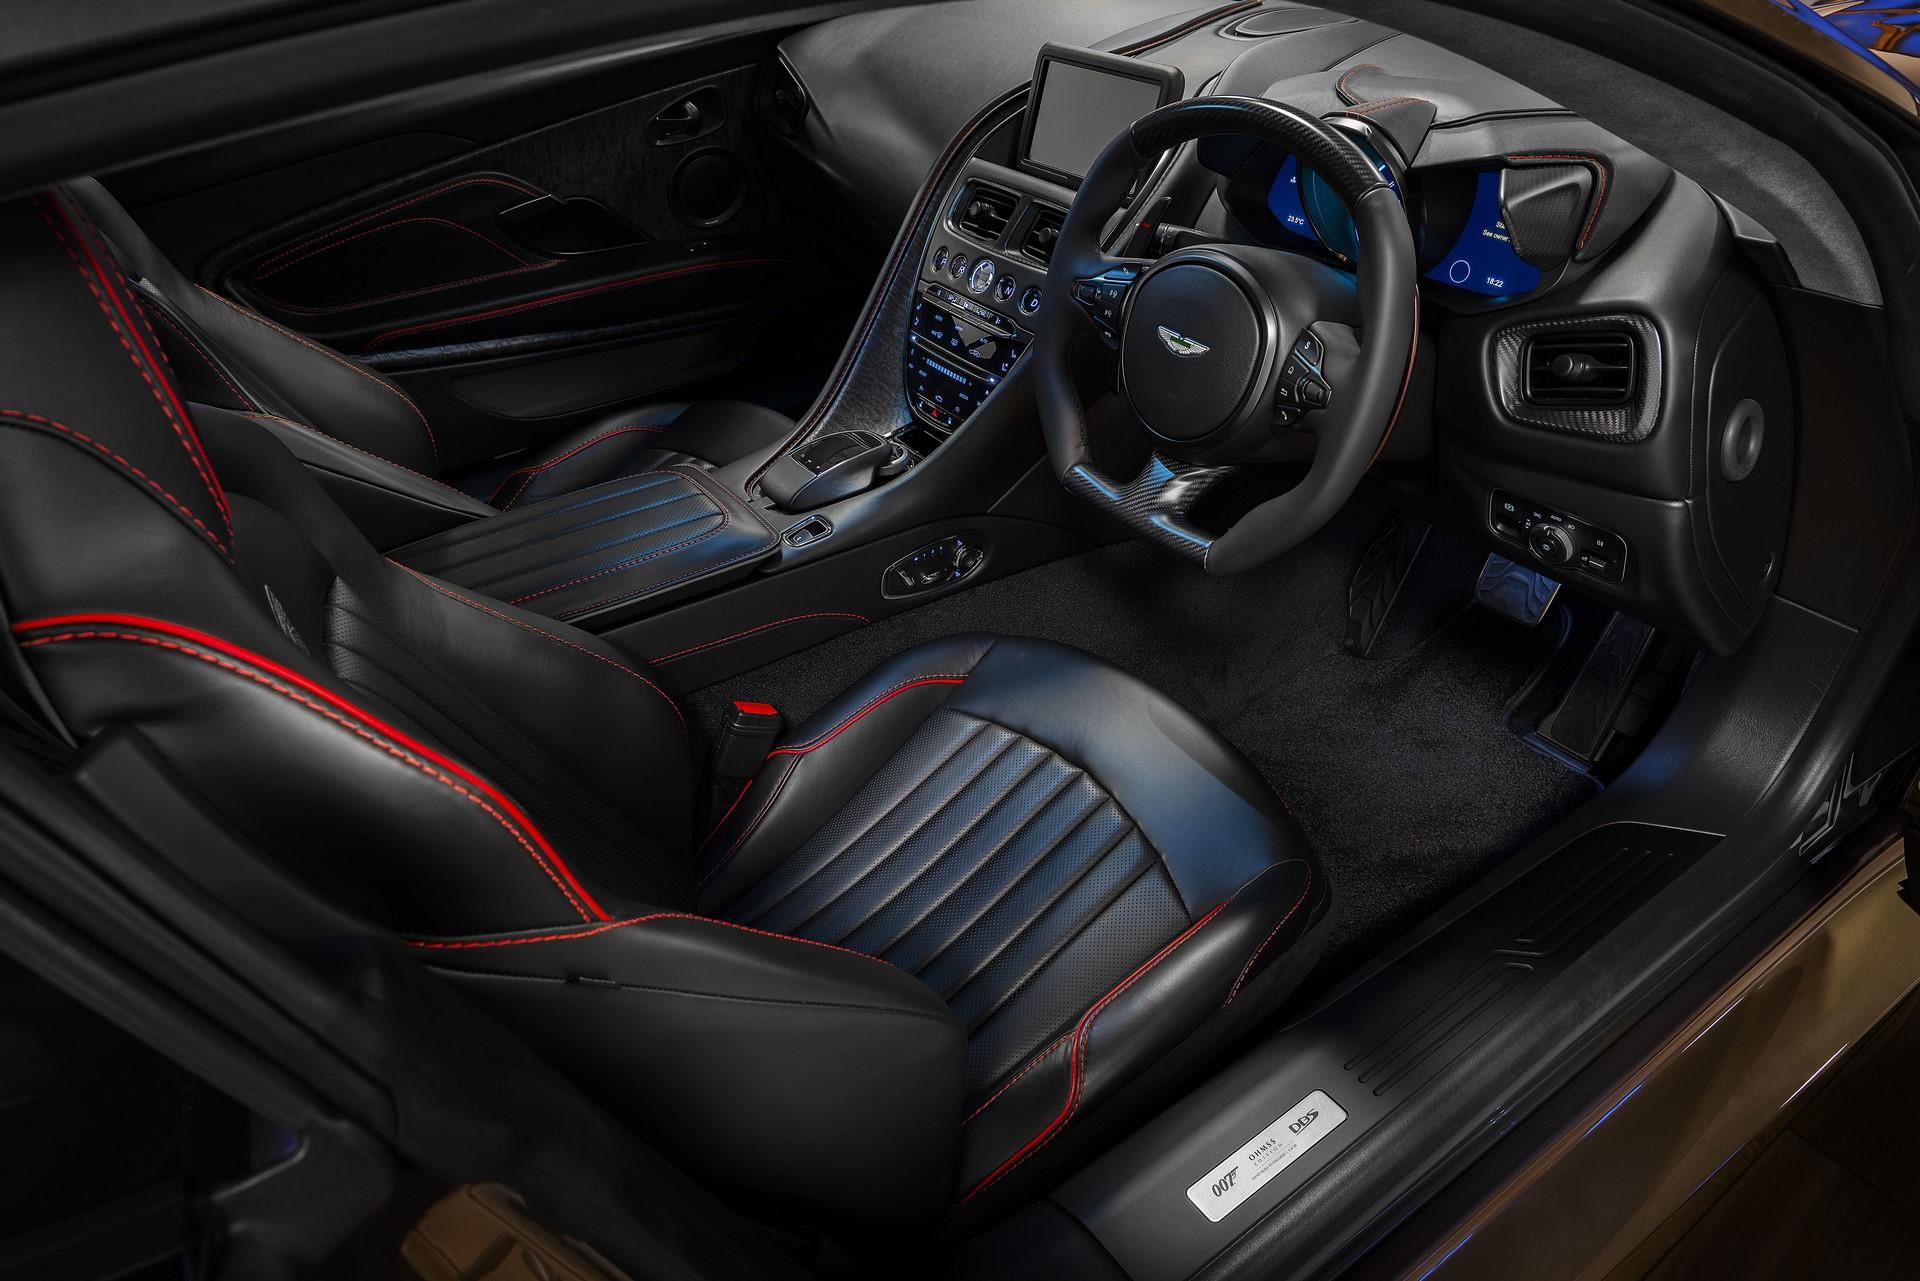 Aston-Martin-DBS-Superleggera-James-Bond-Special-Edition-14